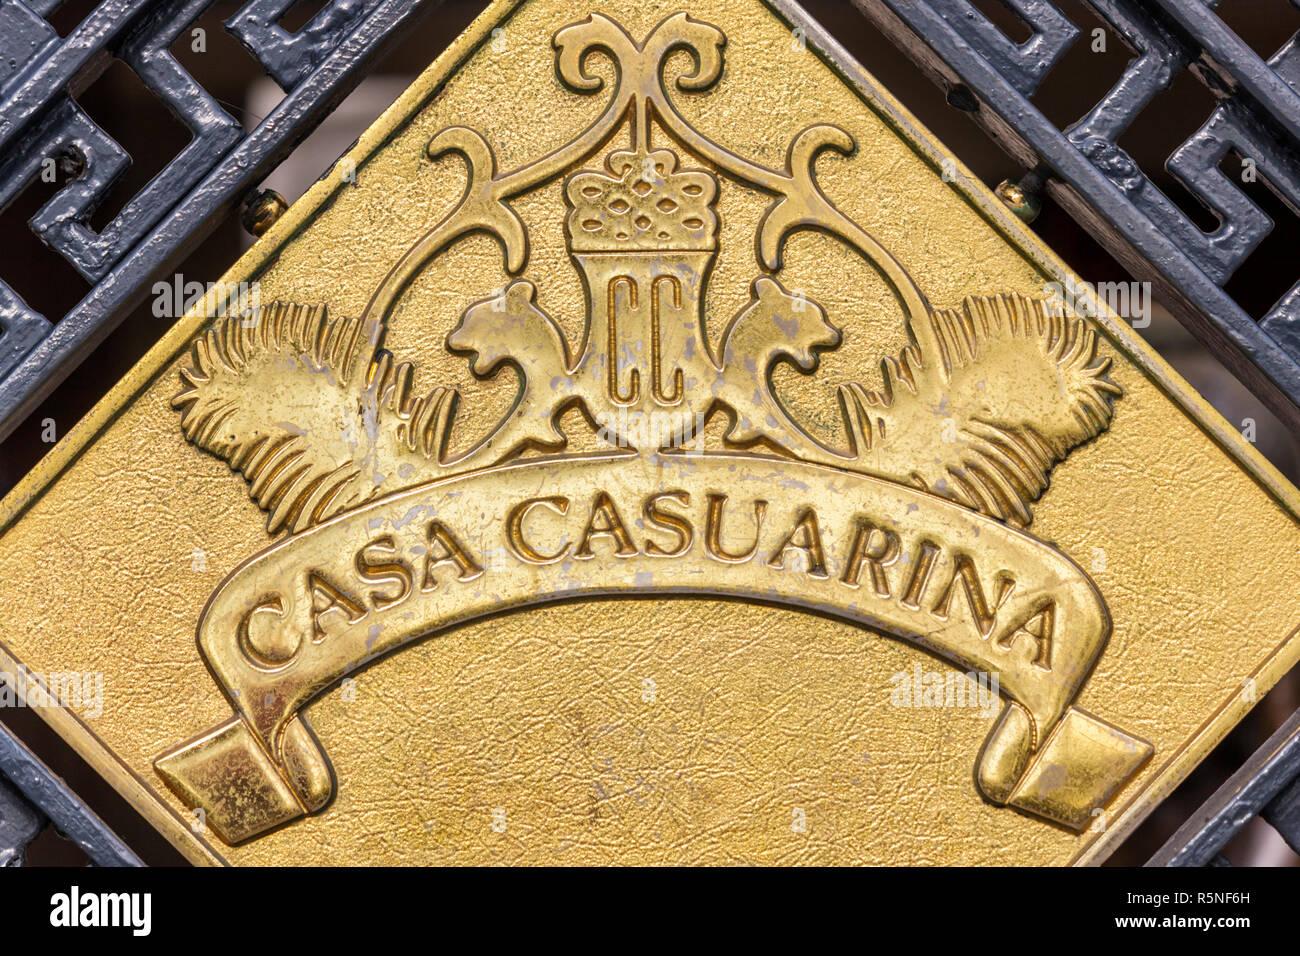 Miami Beach Florida Ocean Drive metal gate Casa Casuarina Gianni Versace mansion entrance logo - Stock Image